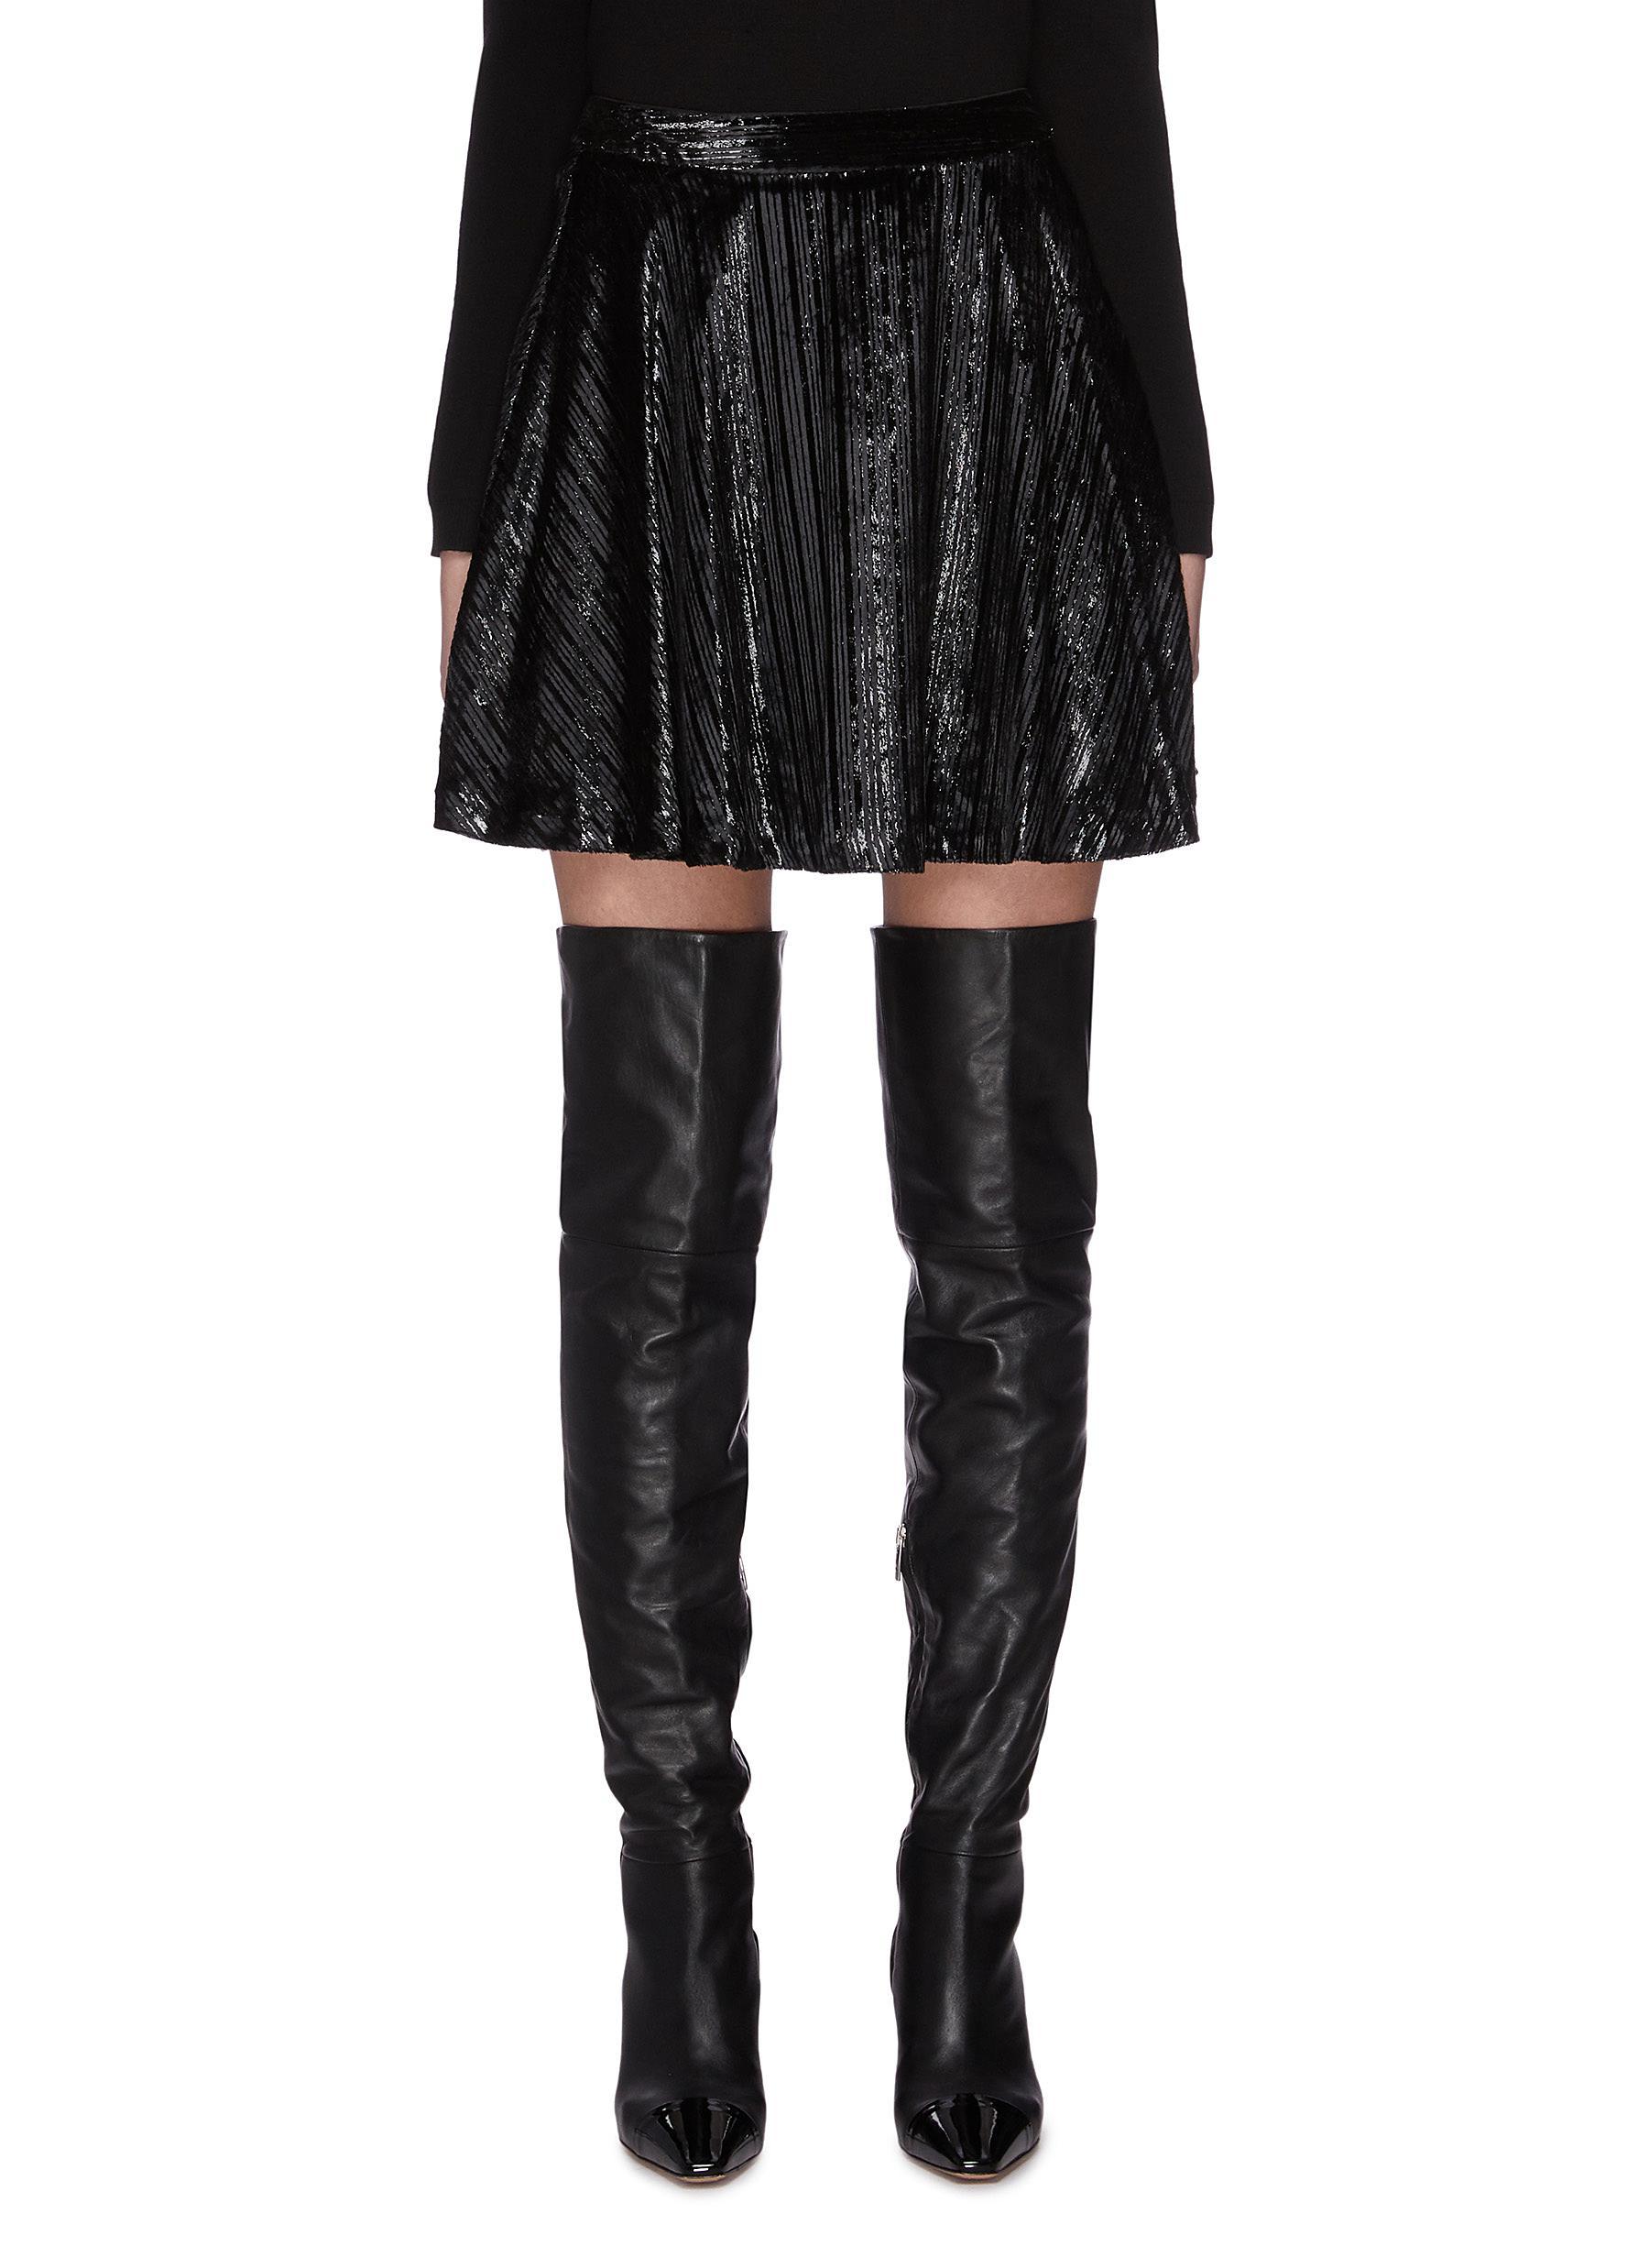 Buy Alice + Olivia Skirts 'Blaise' mini skirt